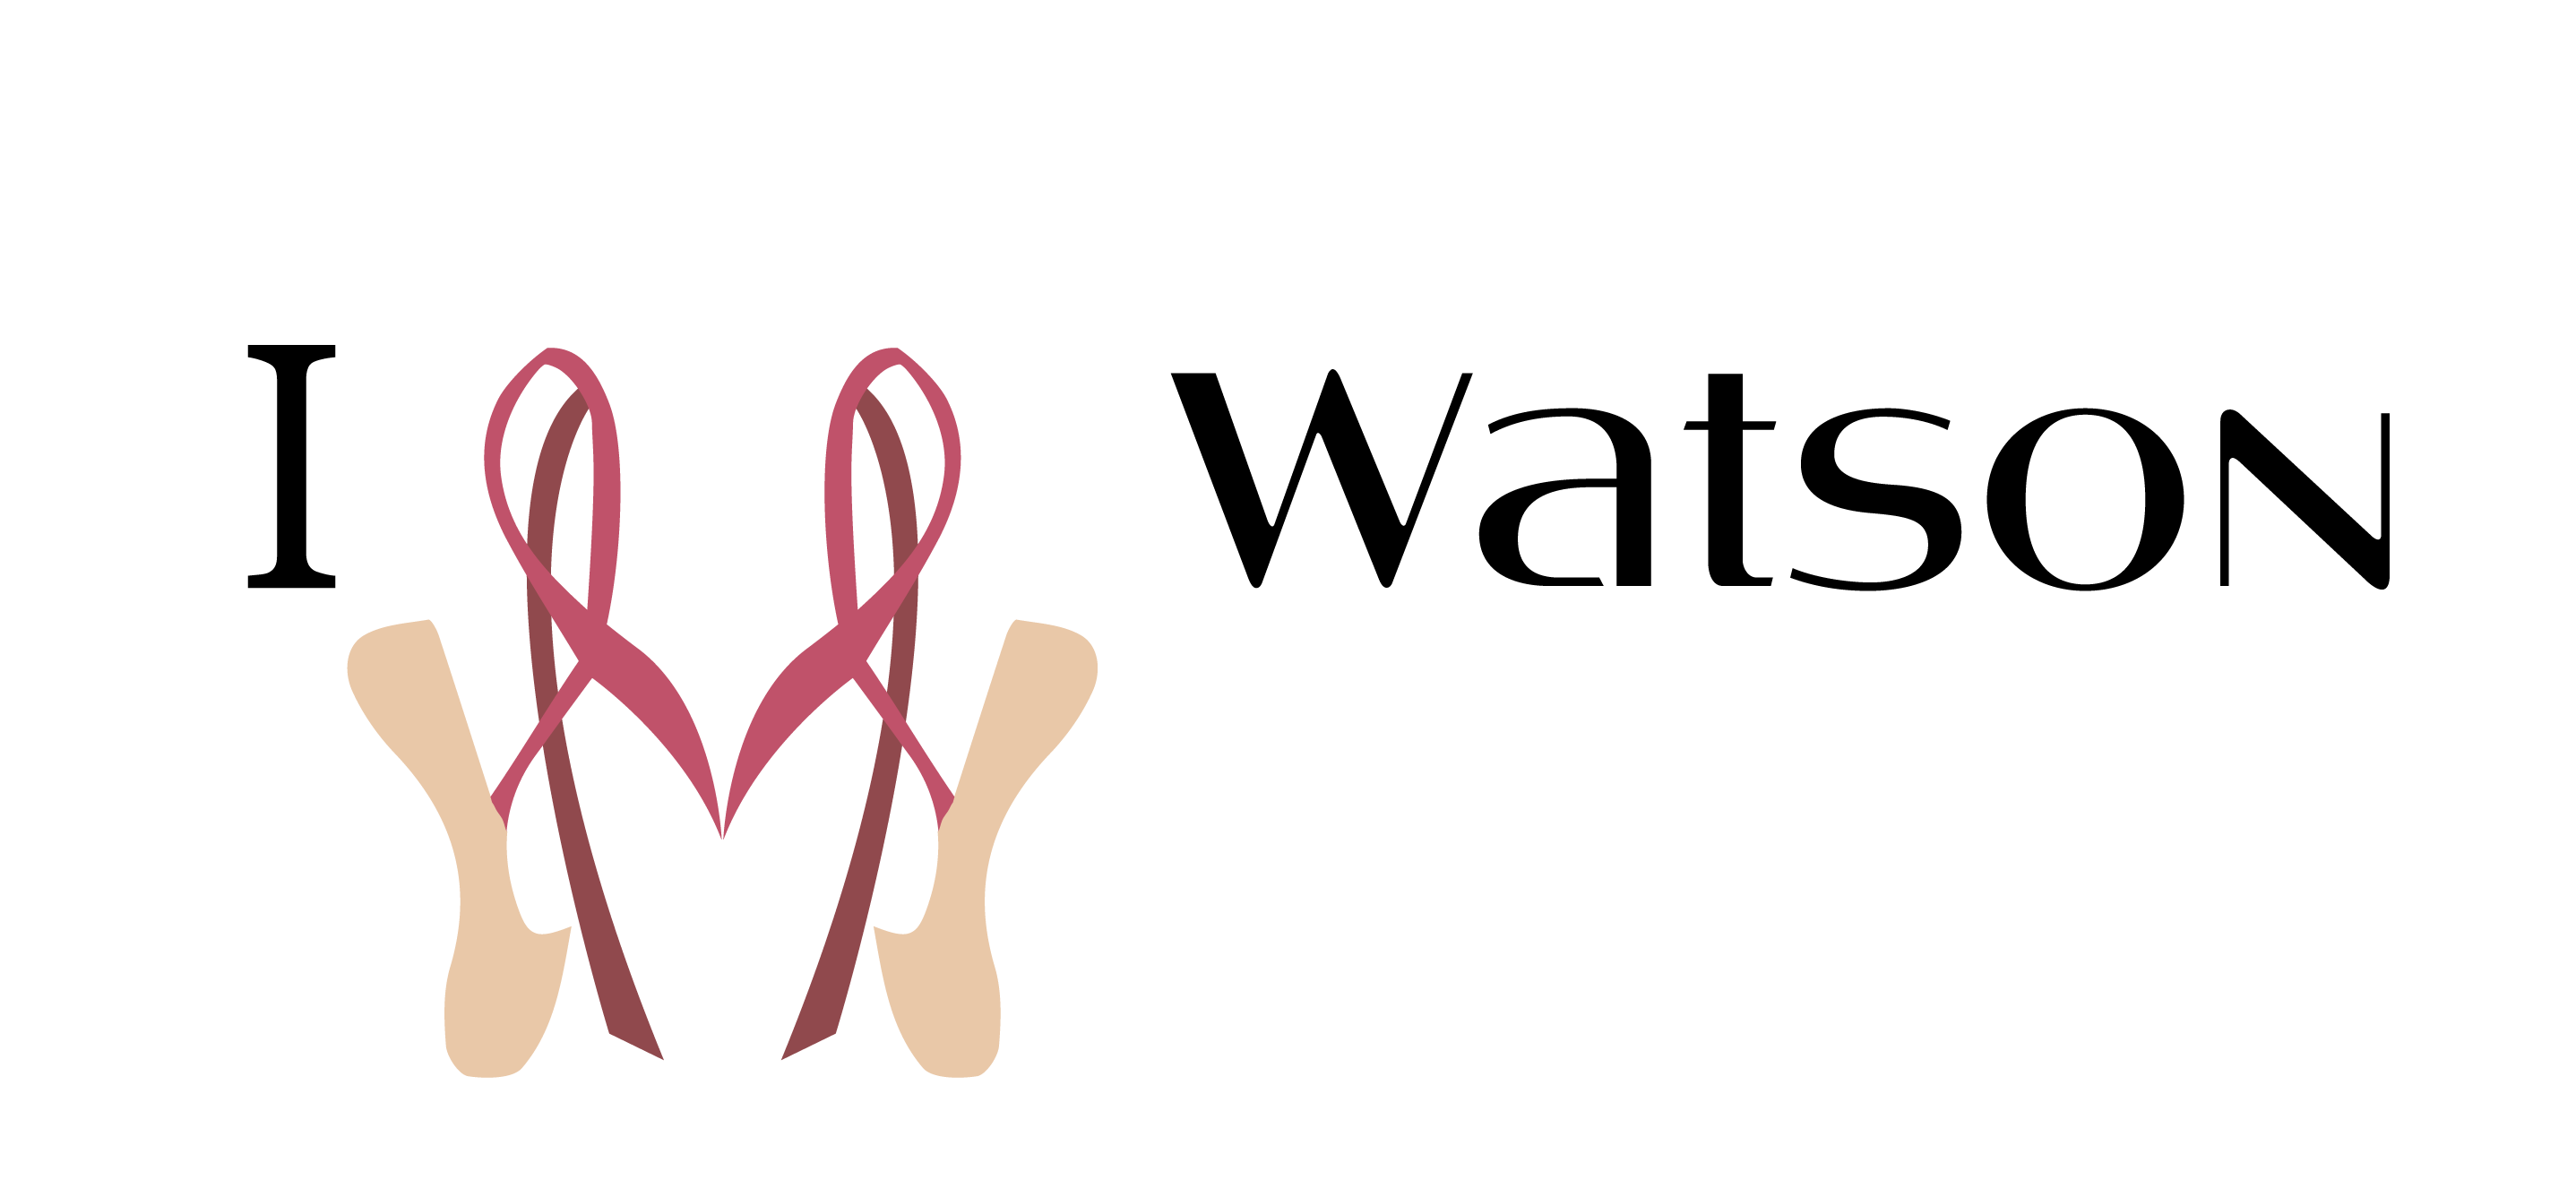 Разработать логотип для балетного бренда фото f_1035bbf4d5678e09.png